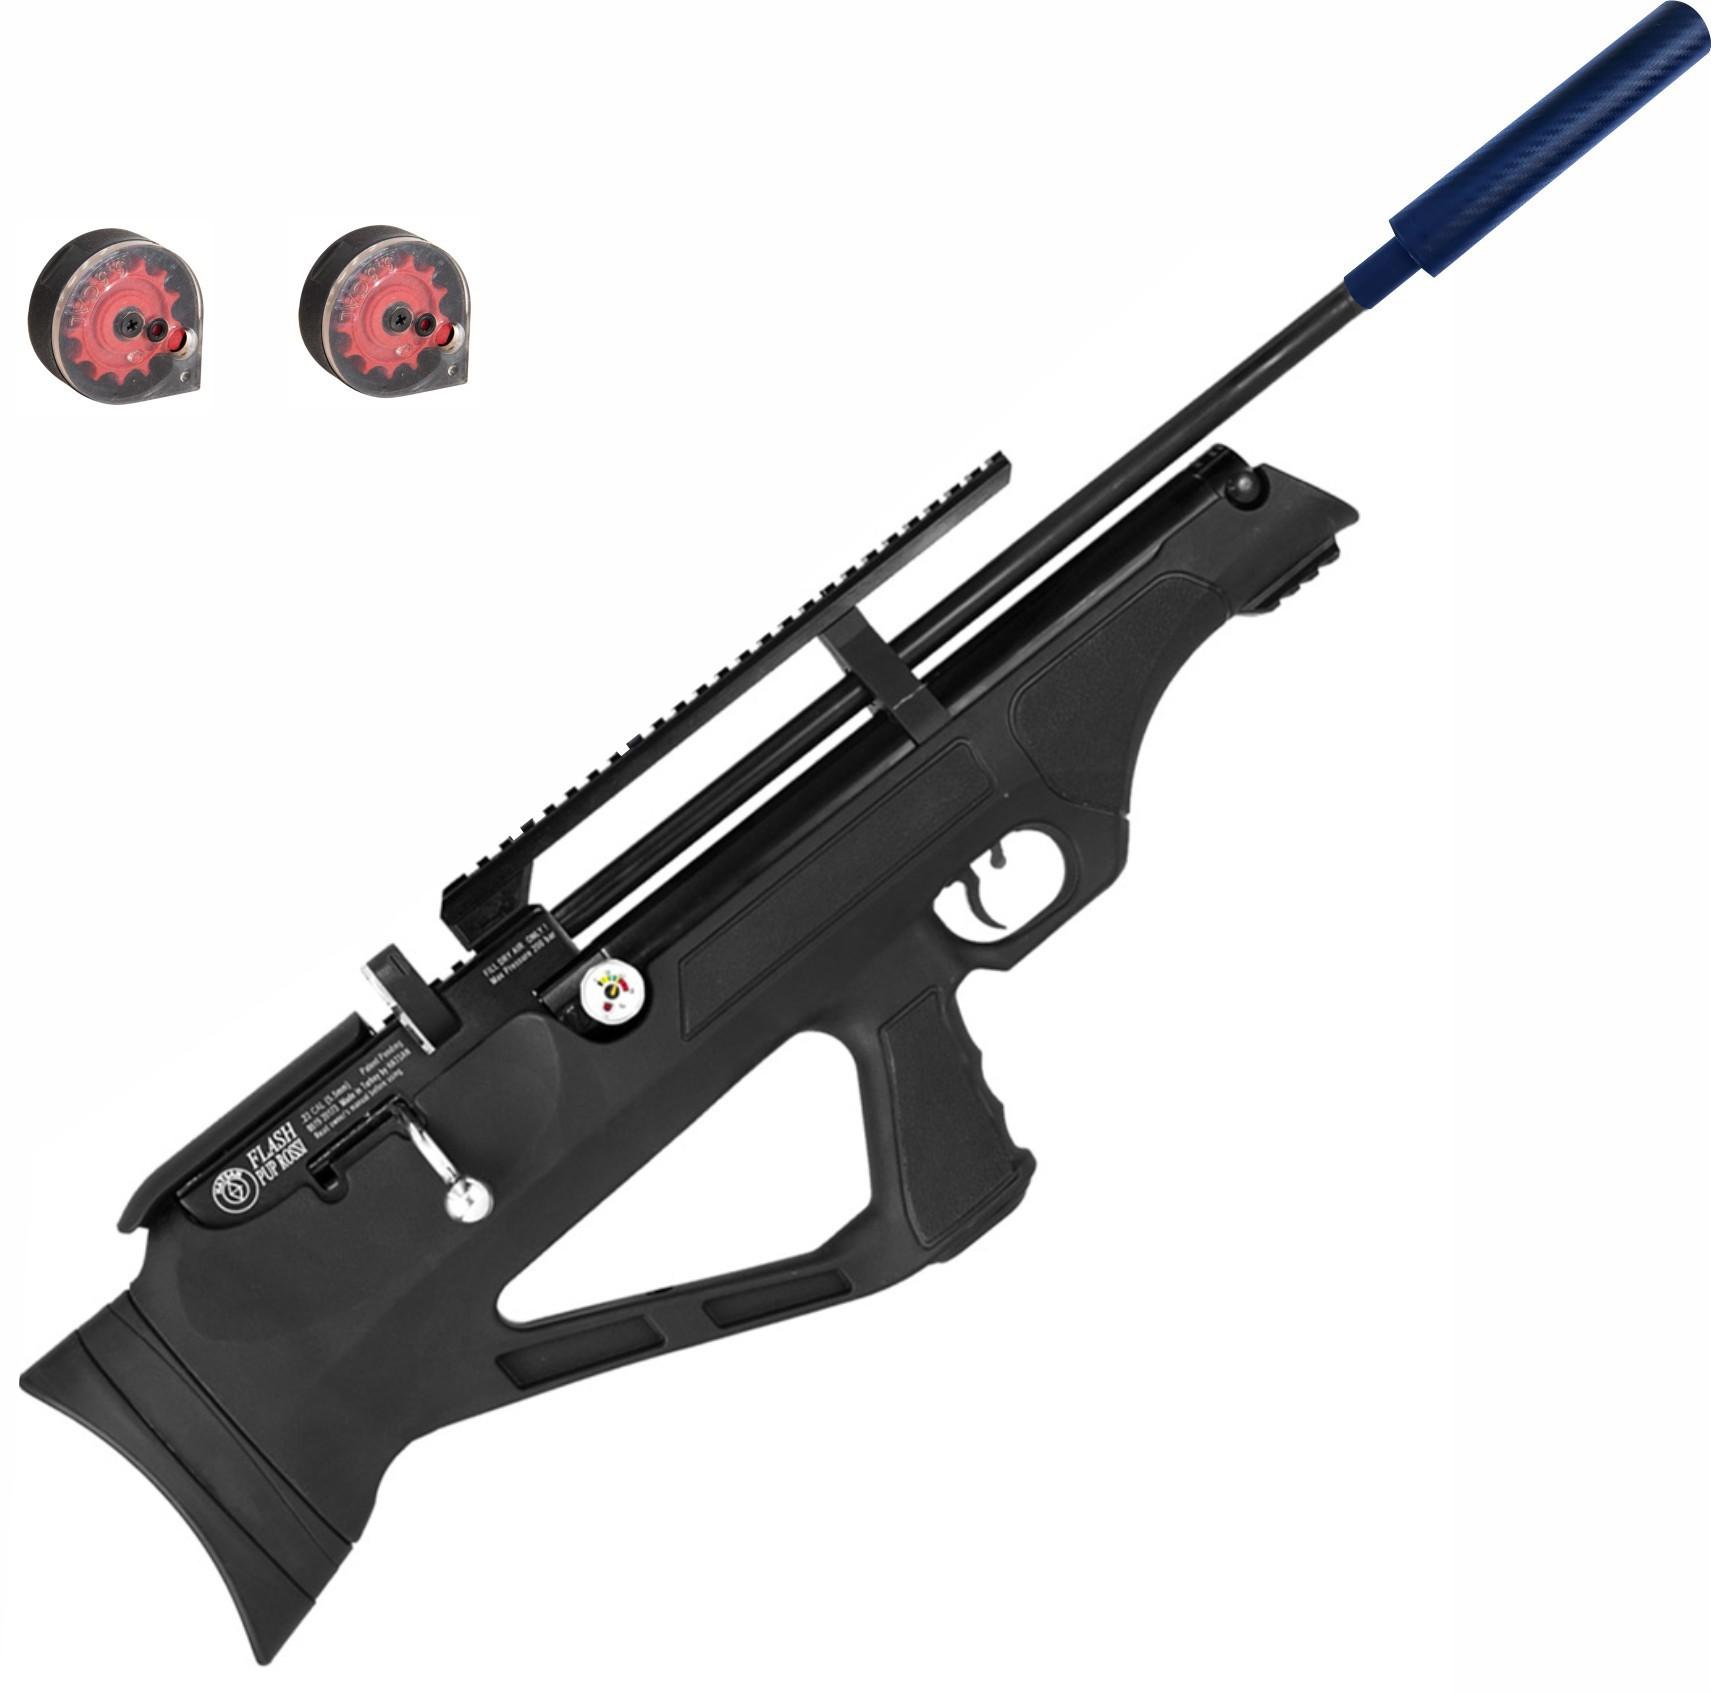 Carabina de Pressão Hatsan PCP Bullpup Flashpup 12 tiros Polimero 5,5mm com supressor